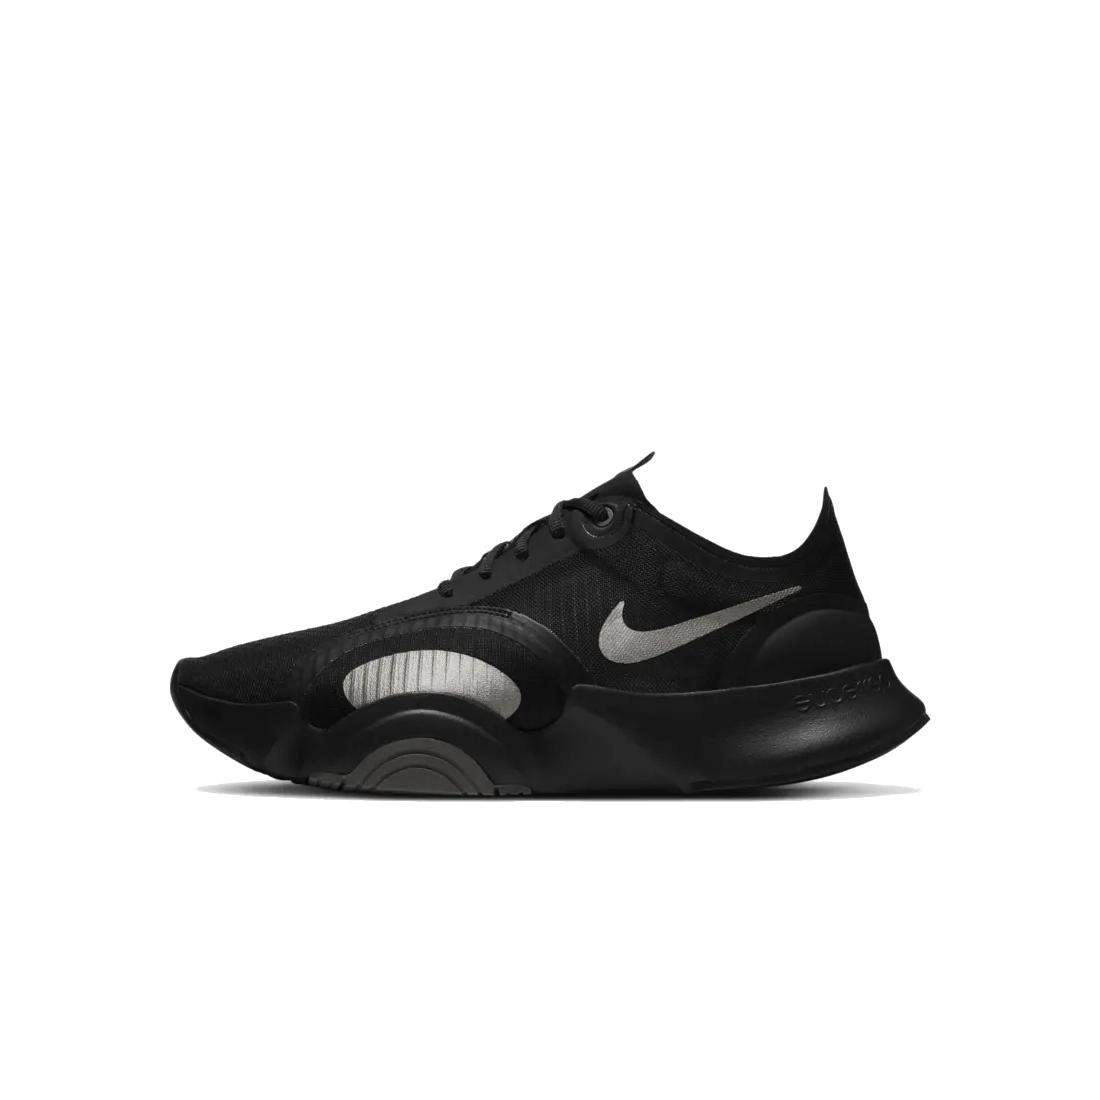 Nike SuperRep Go Herren Trainingsschuhe - black/metalic pewter-iron grey-metalic pewter CJ0773-001